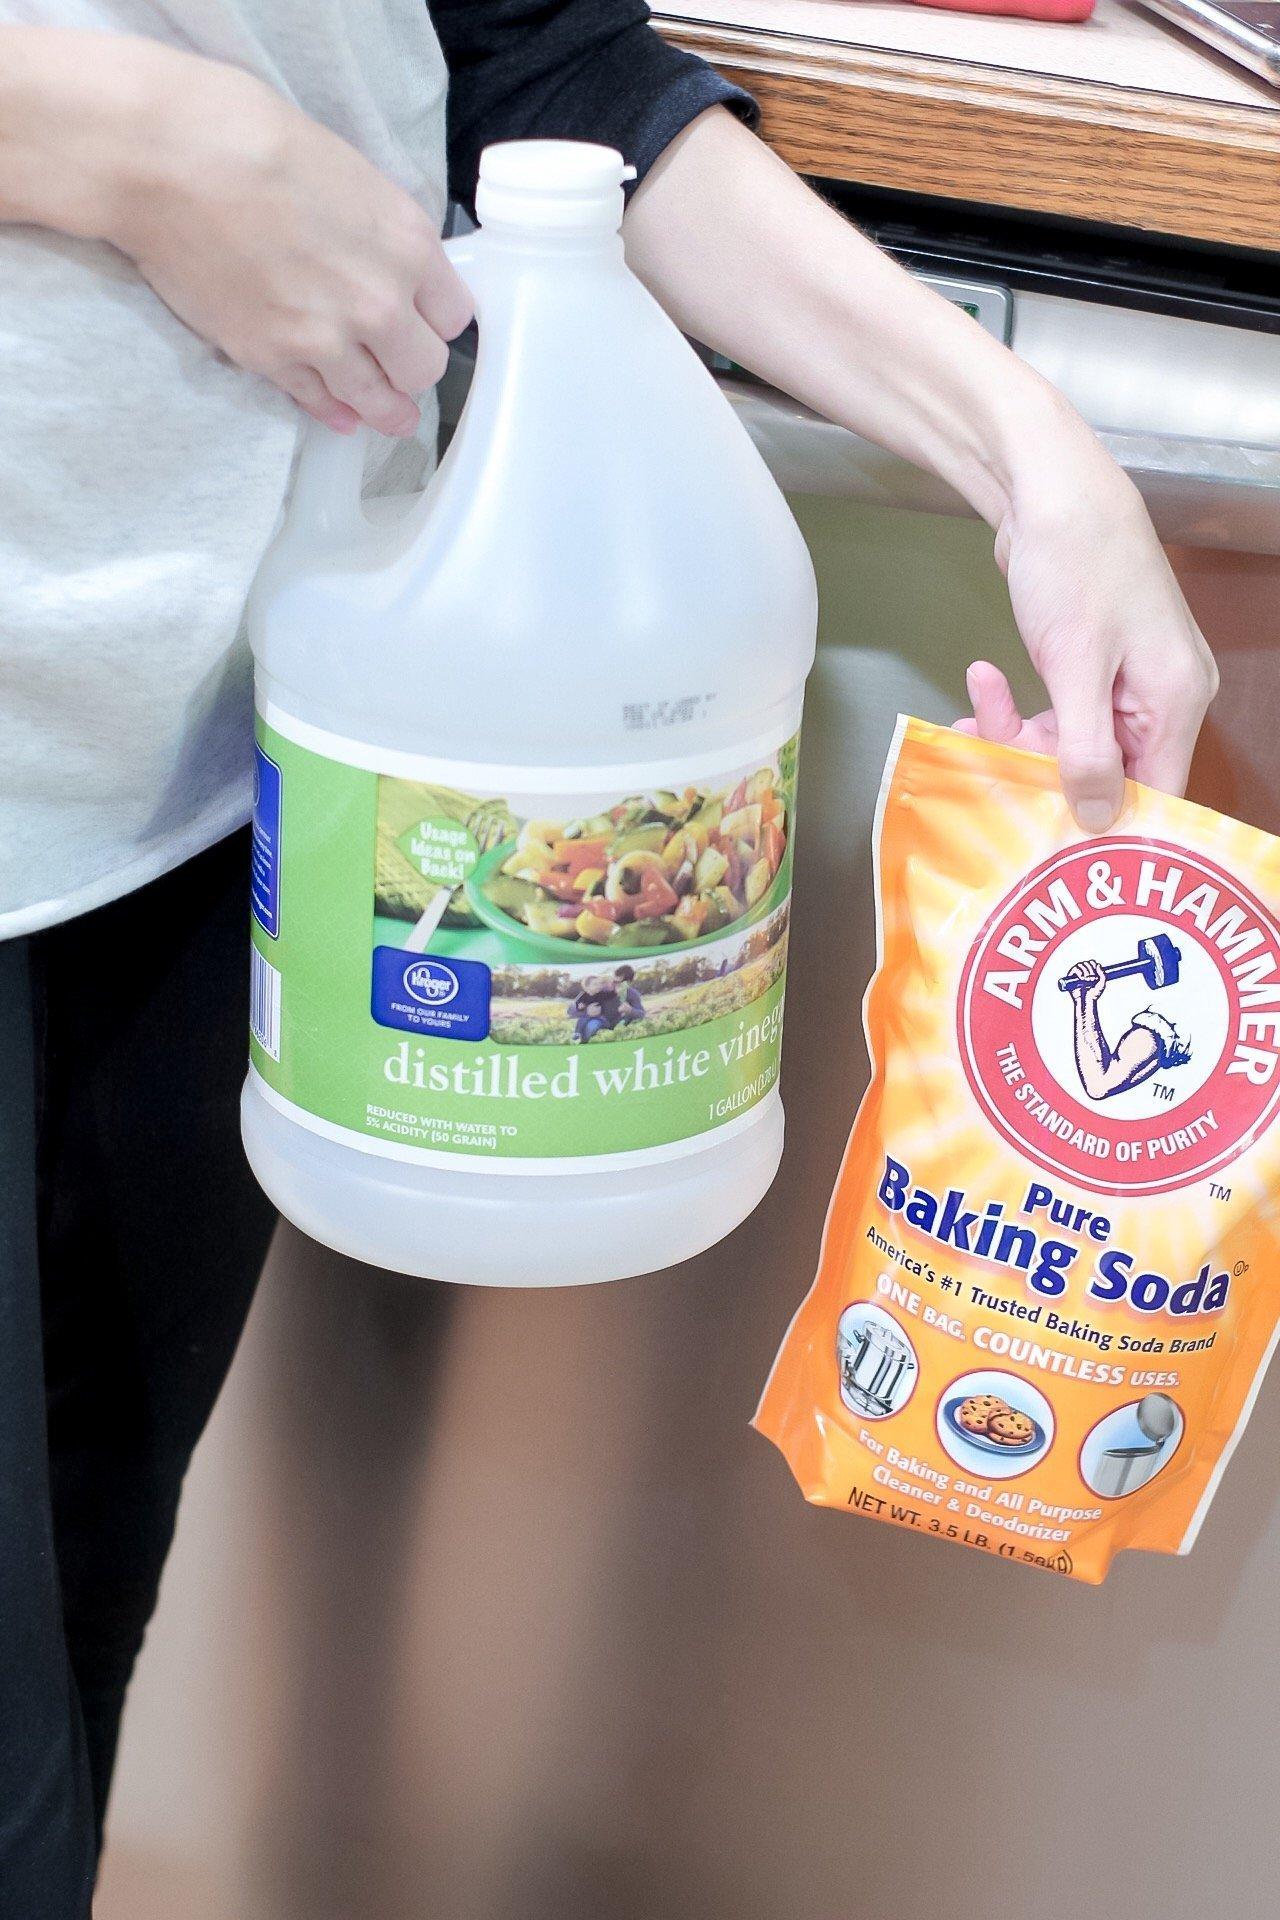 vinegar and baking soda